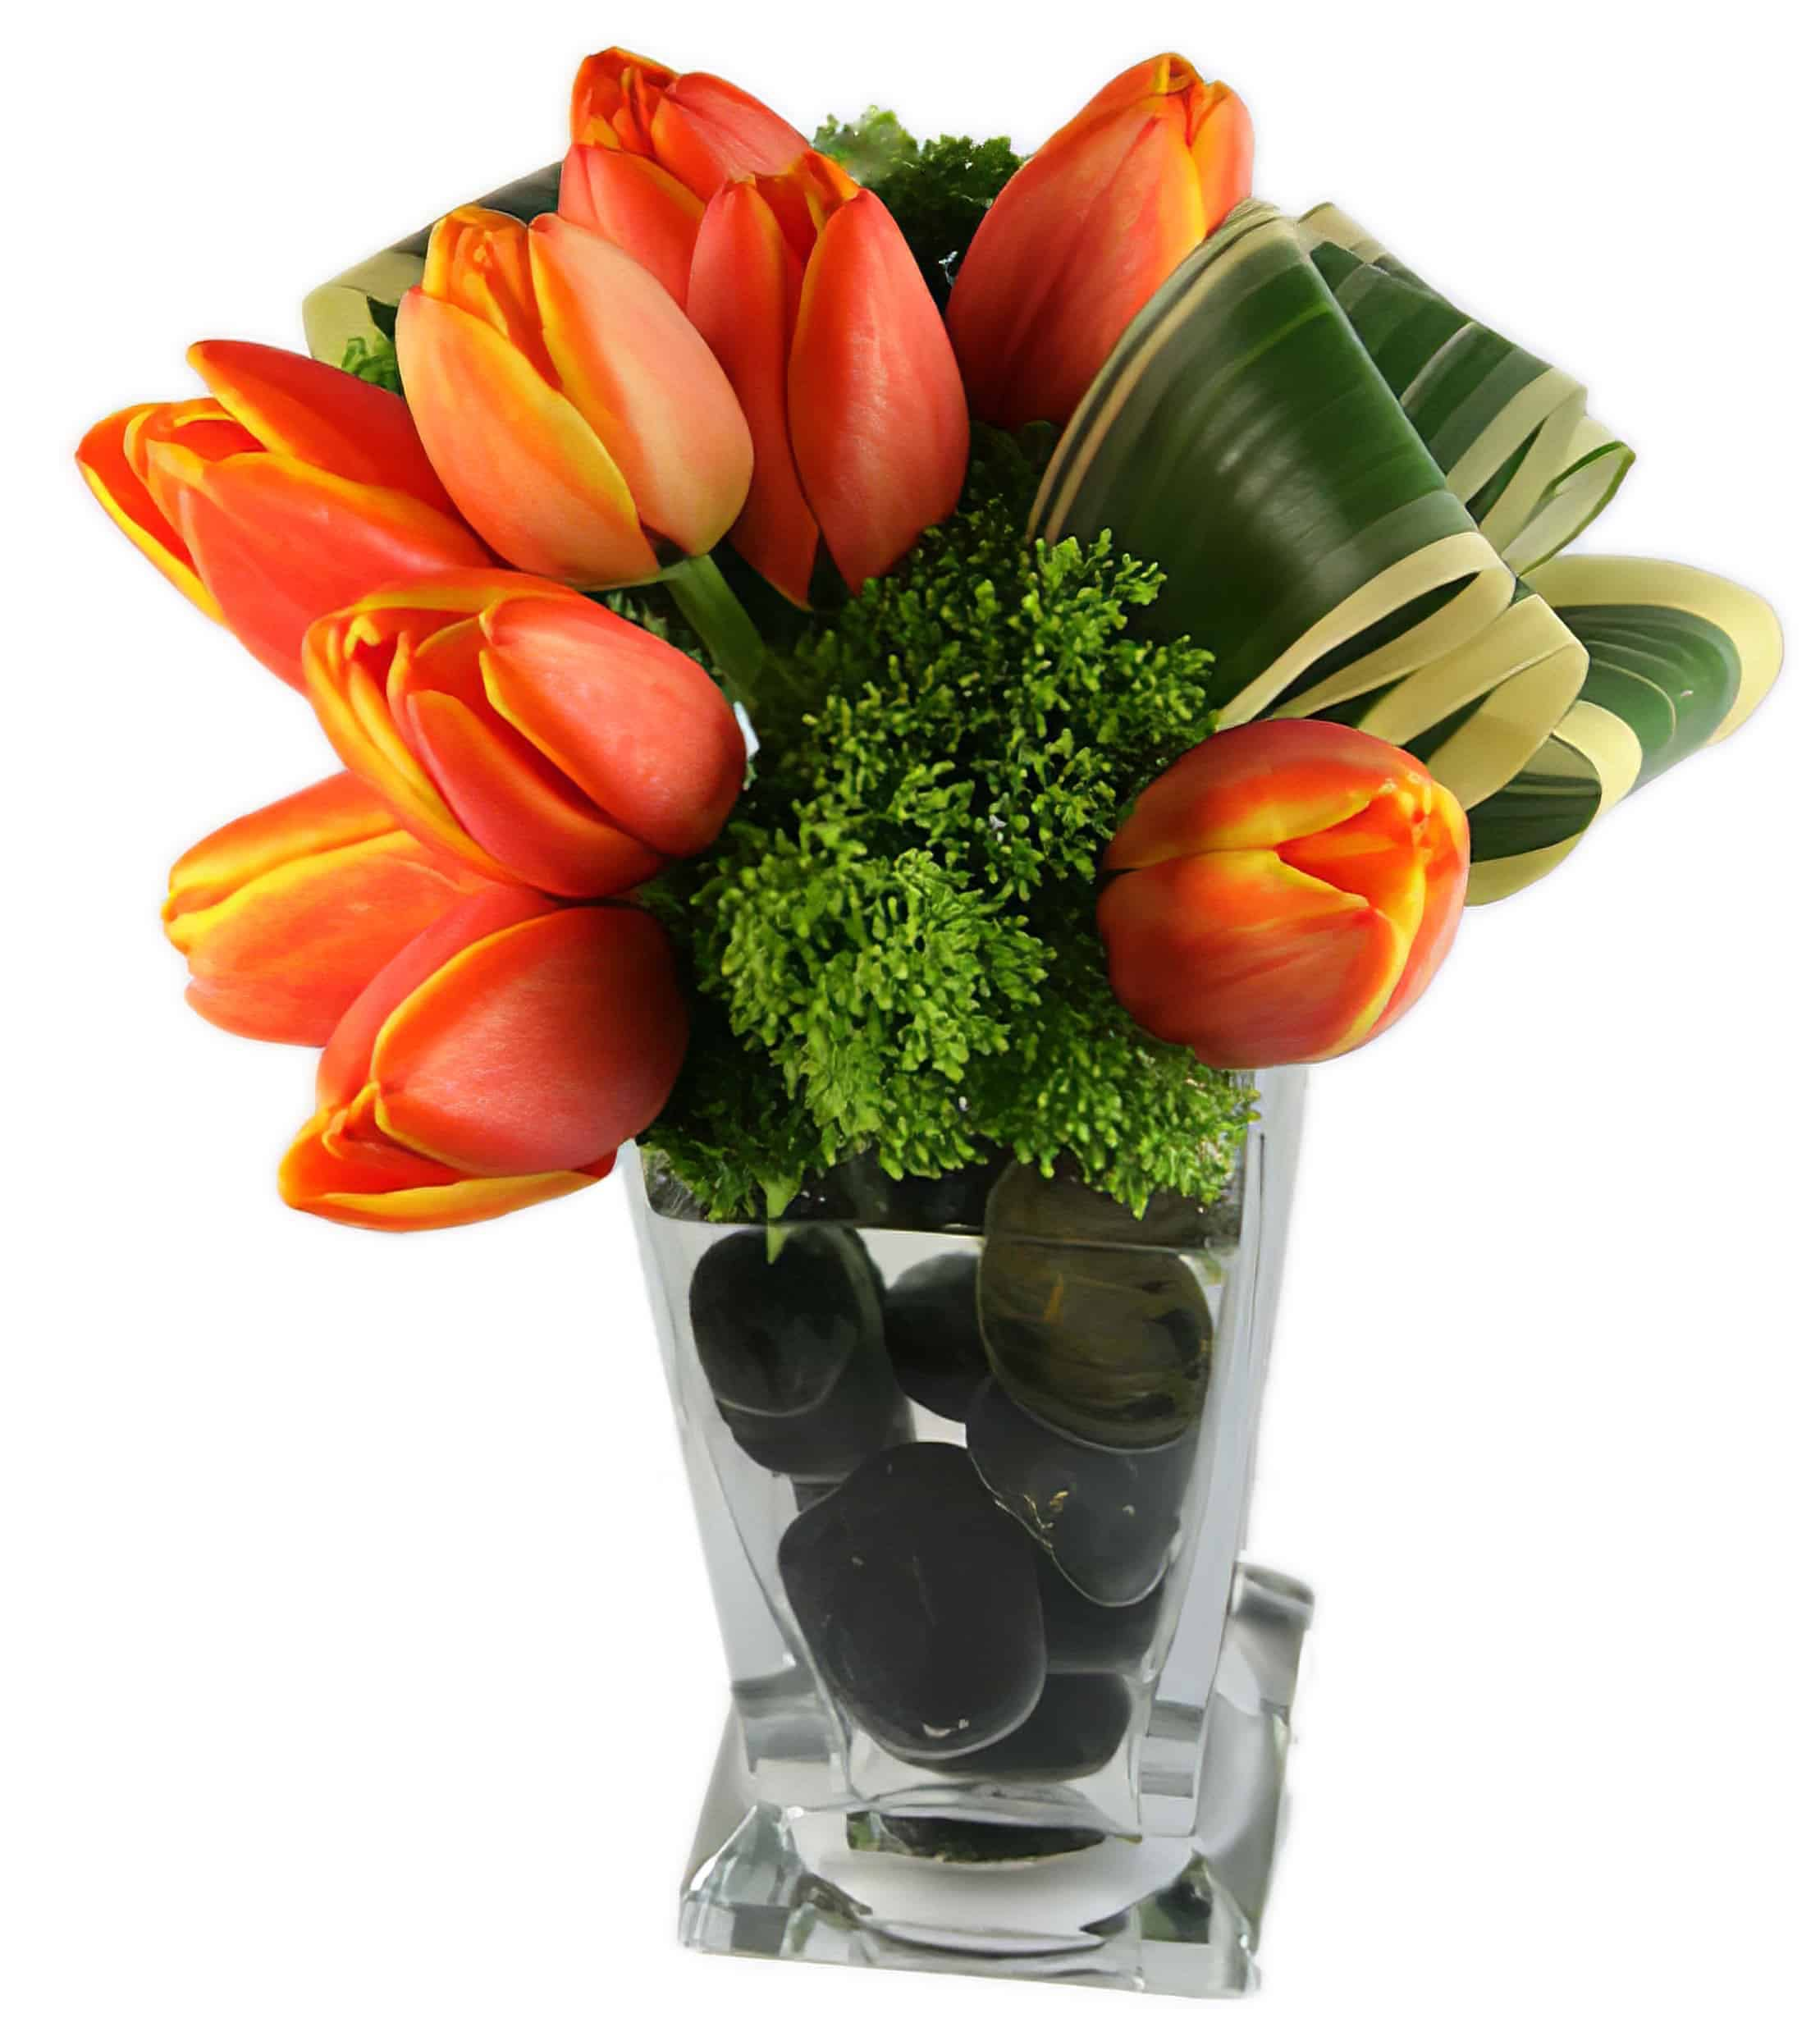 Jubilee Flower Arrangement | San Francisco Florist Since 1871 Free Bay Area and San Francisco Flower Delivery